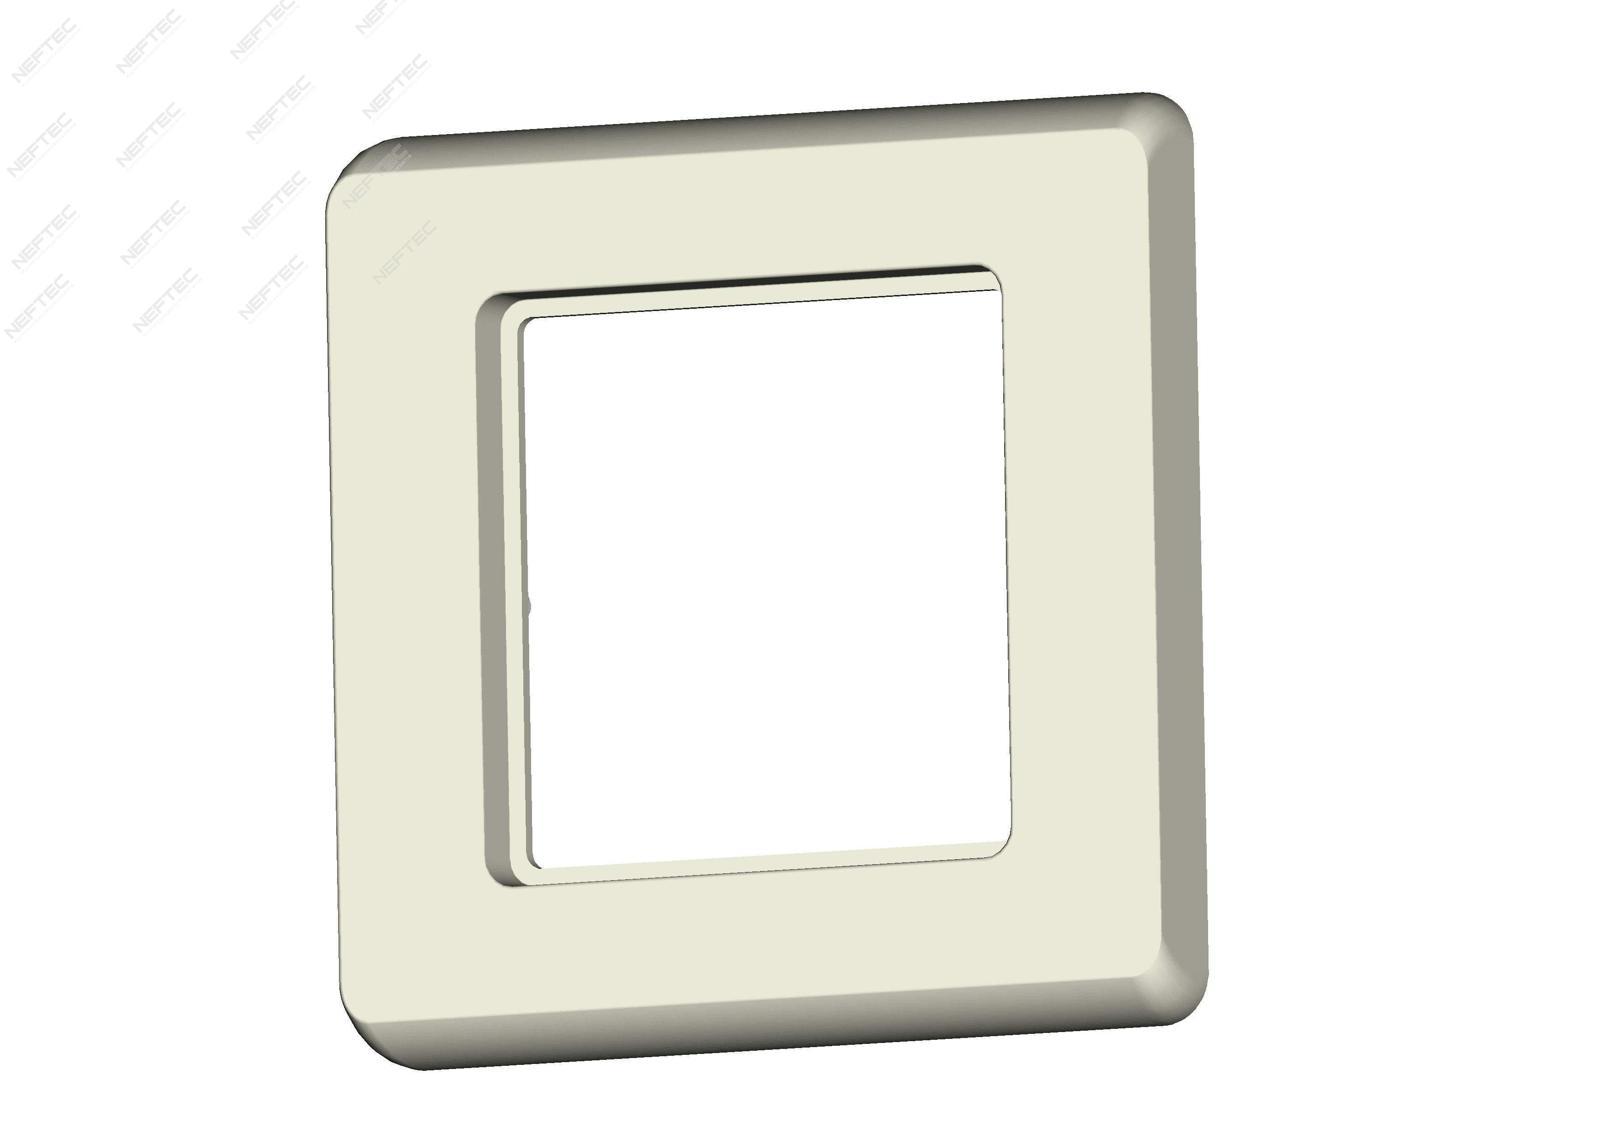 kupfer kabel patch panel verteiler lan telefon catv sat neftec glasfaser lichtwellenleiter aus. Black Bedroom Furniture Sets. Home Design Ideas